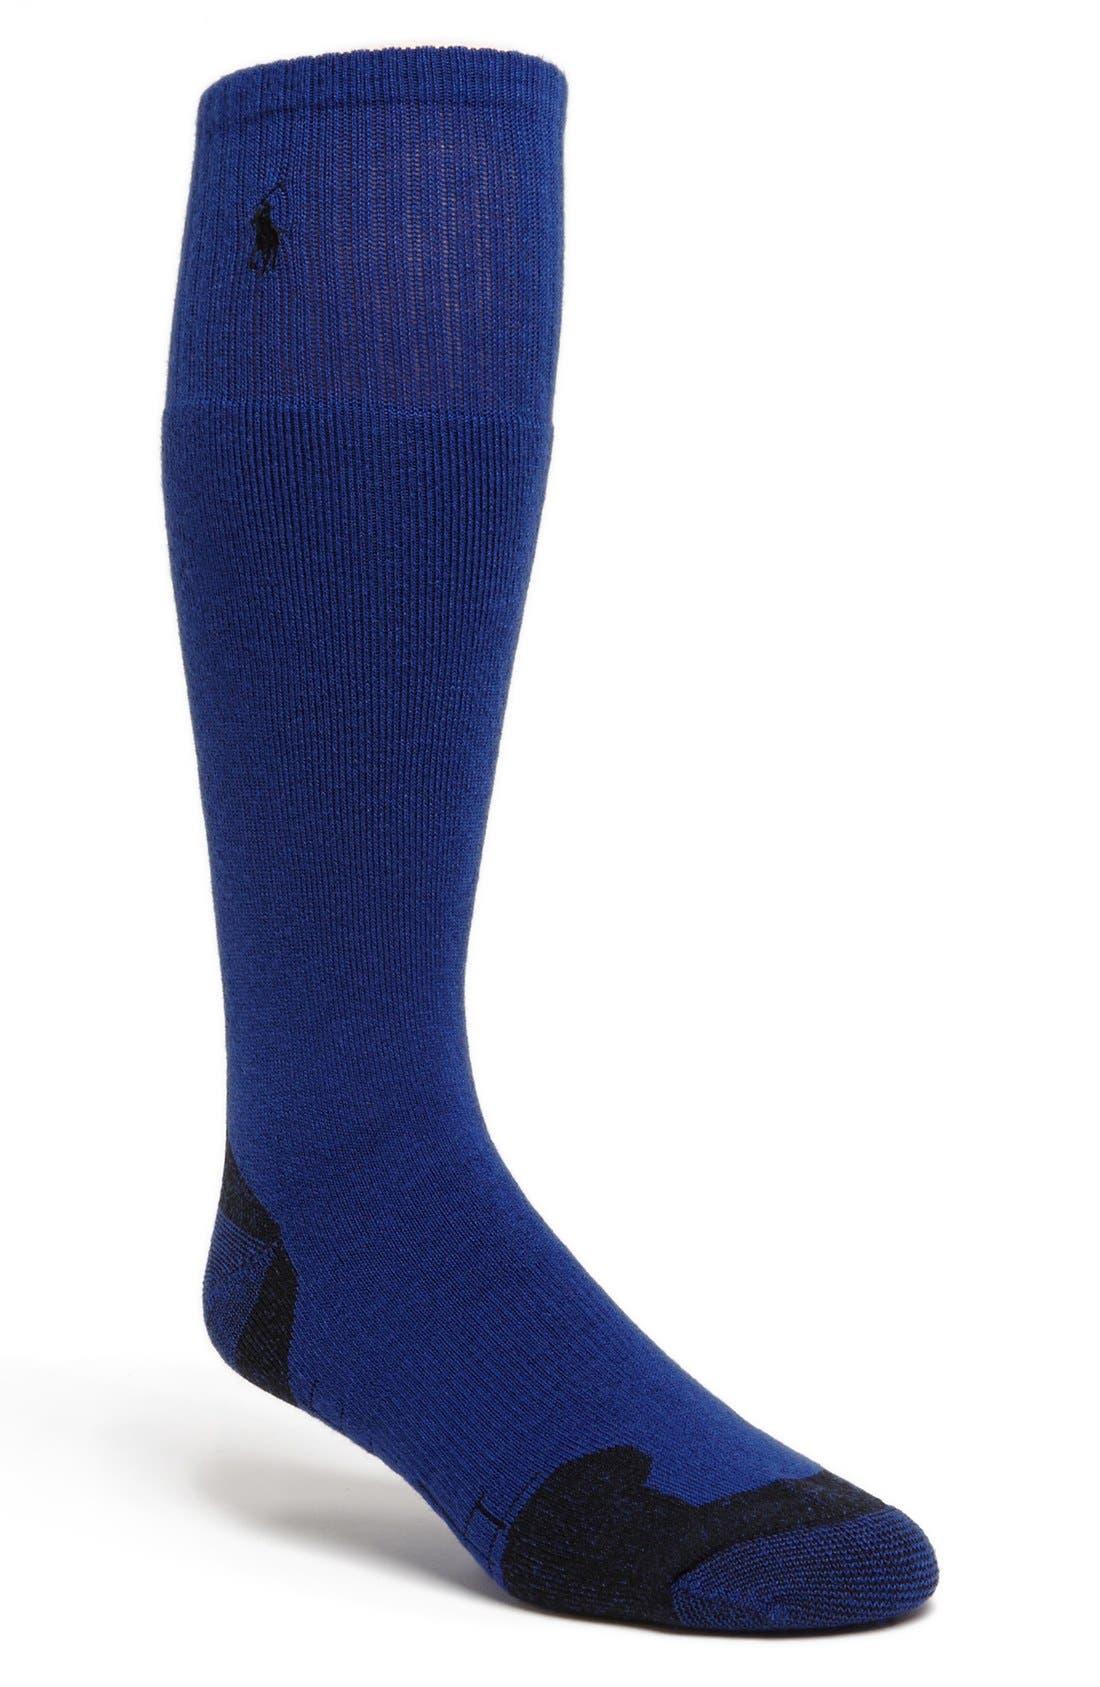 Main Image - Polo Ralph Lauren 'Player Pony' Socks